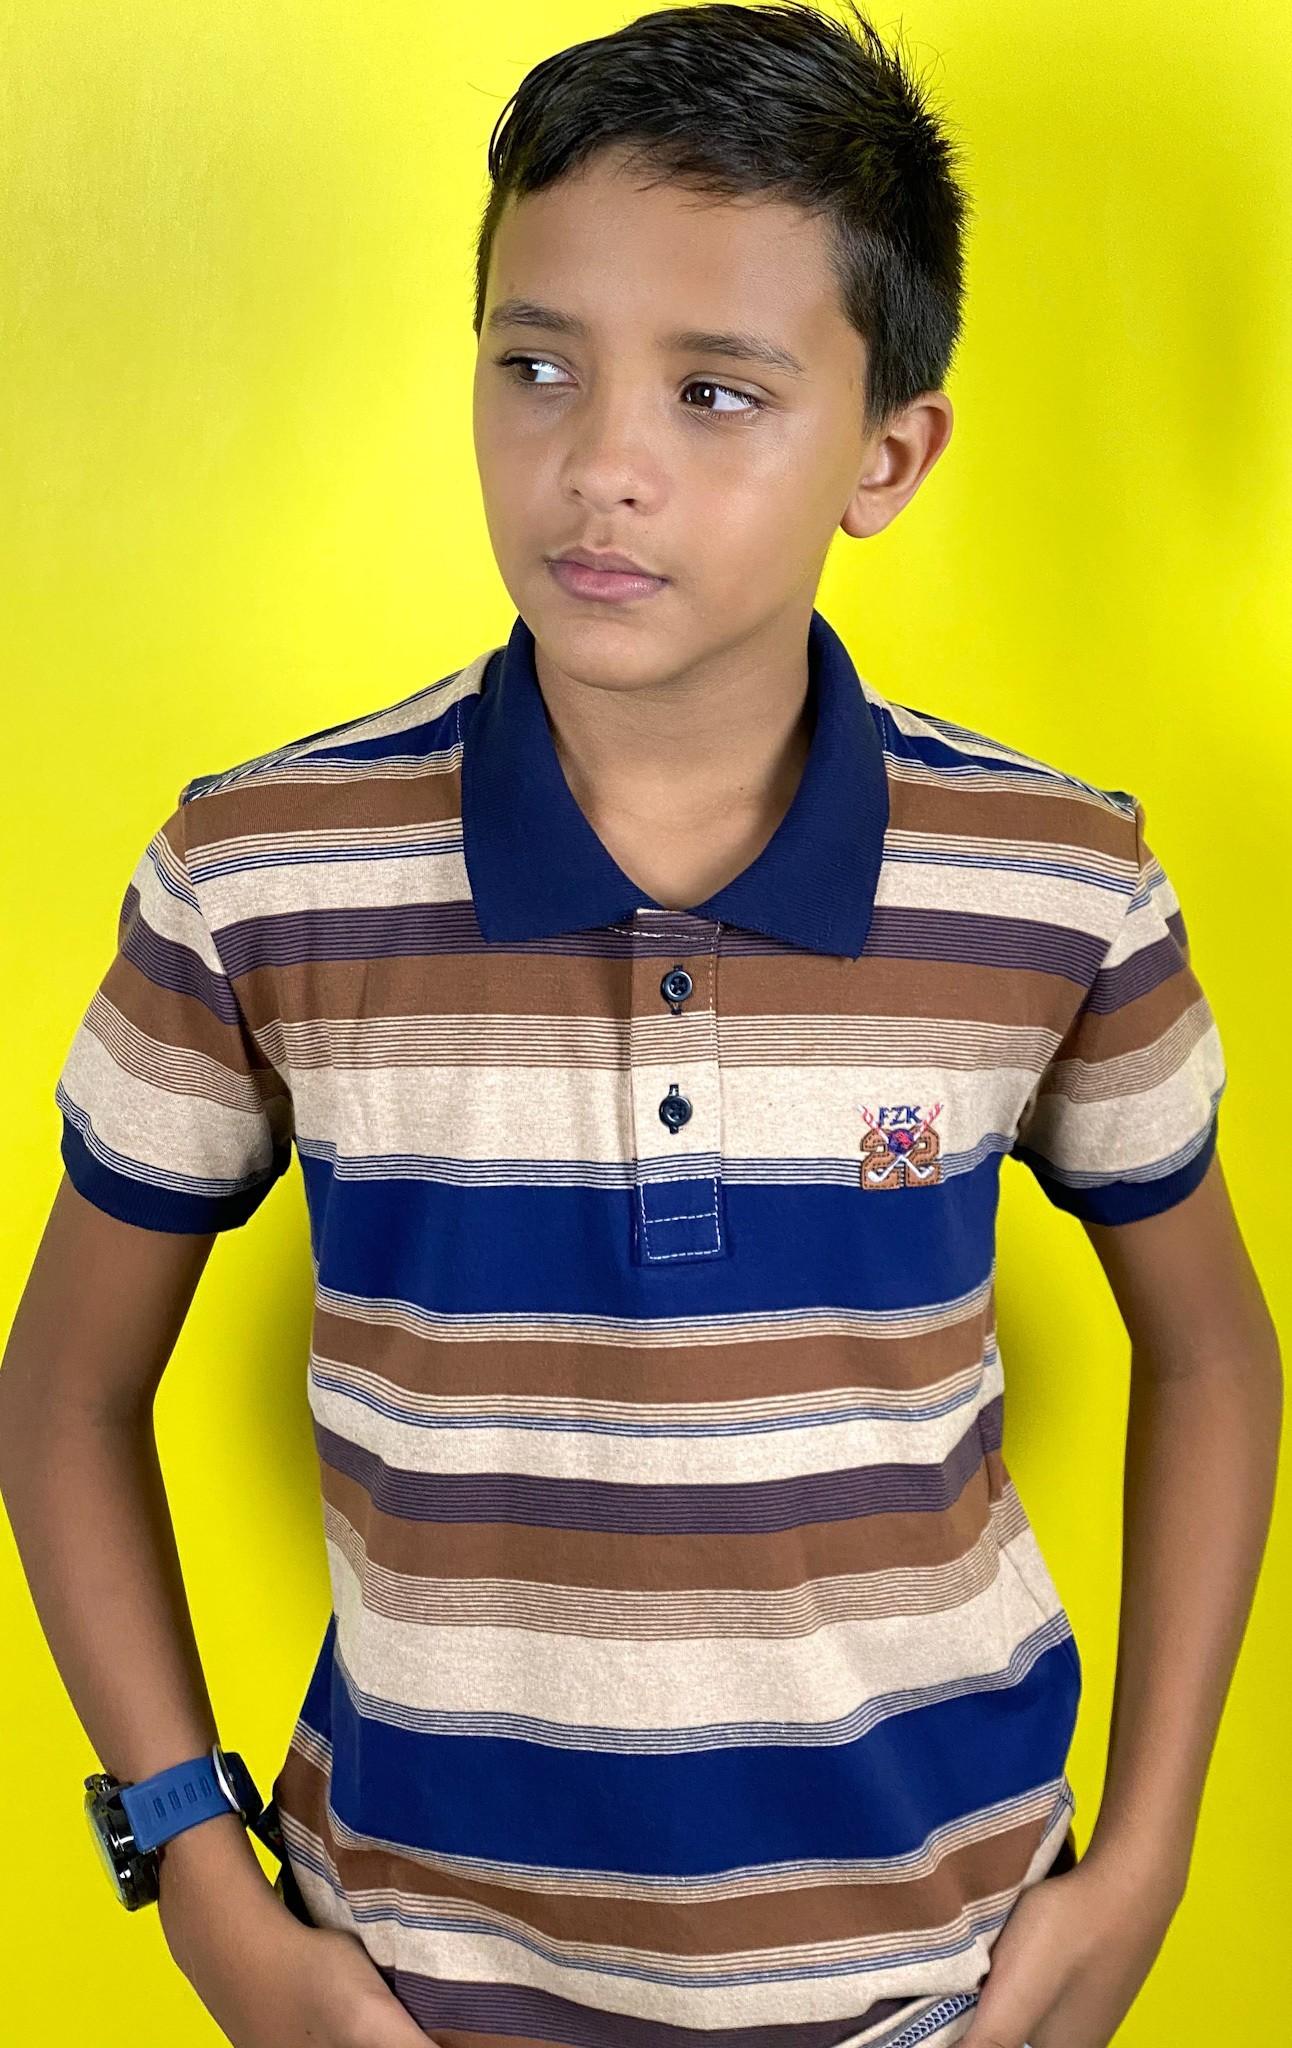 Camiseta Gola Polo de Listras- Fuzzaka Kids